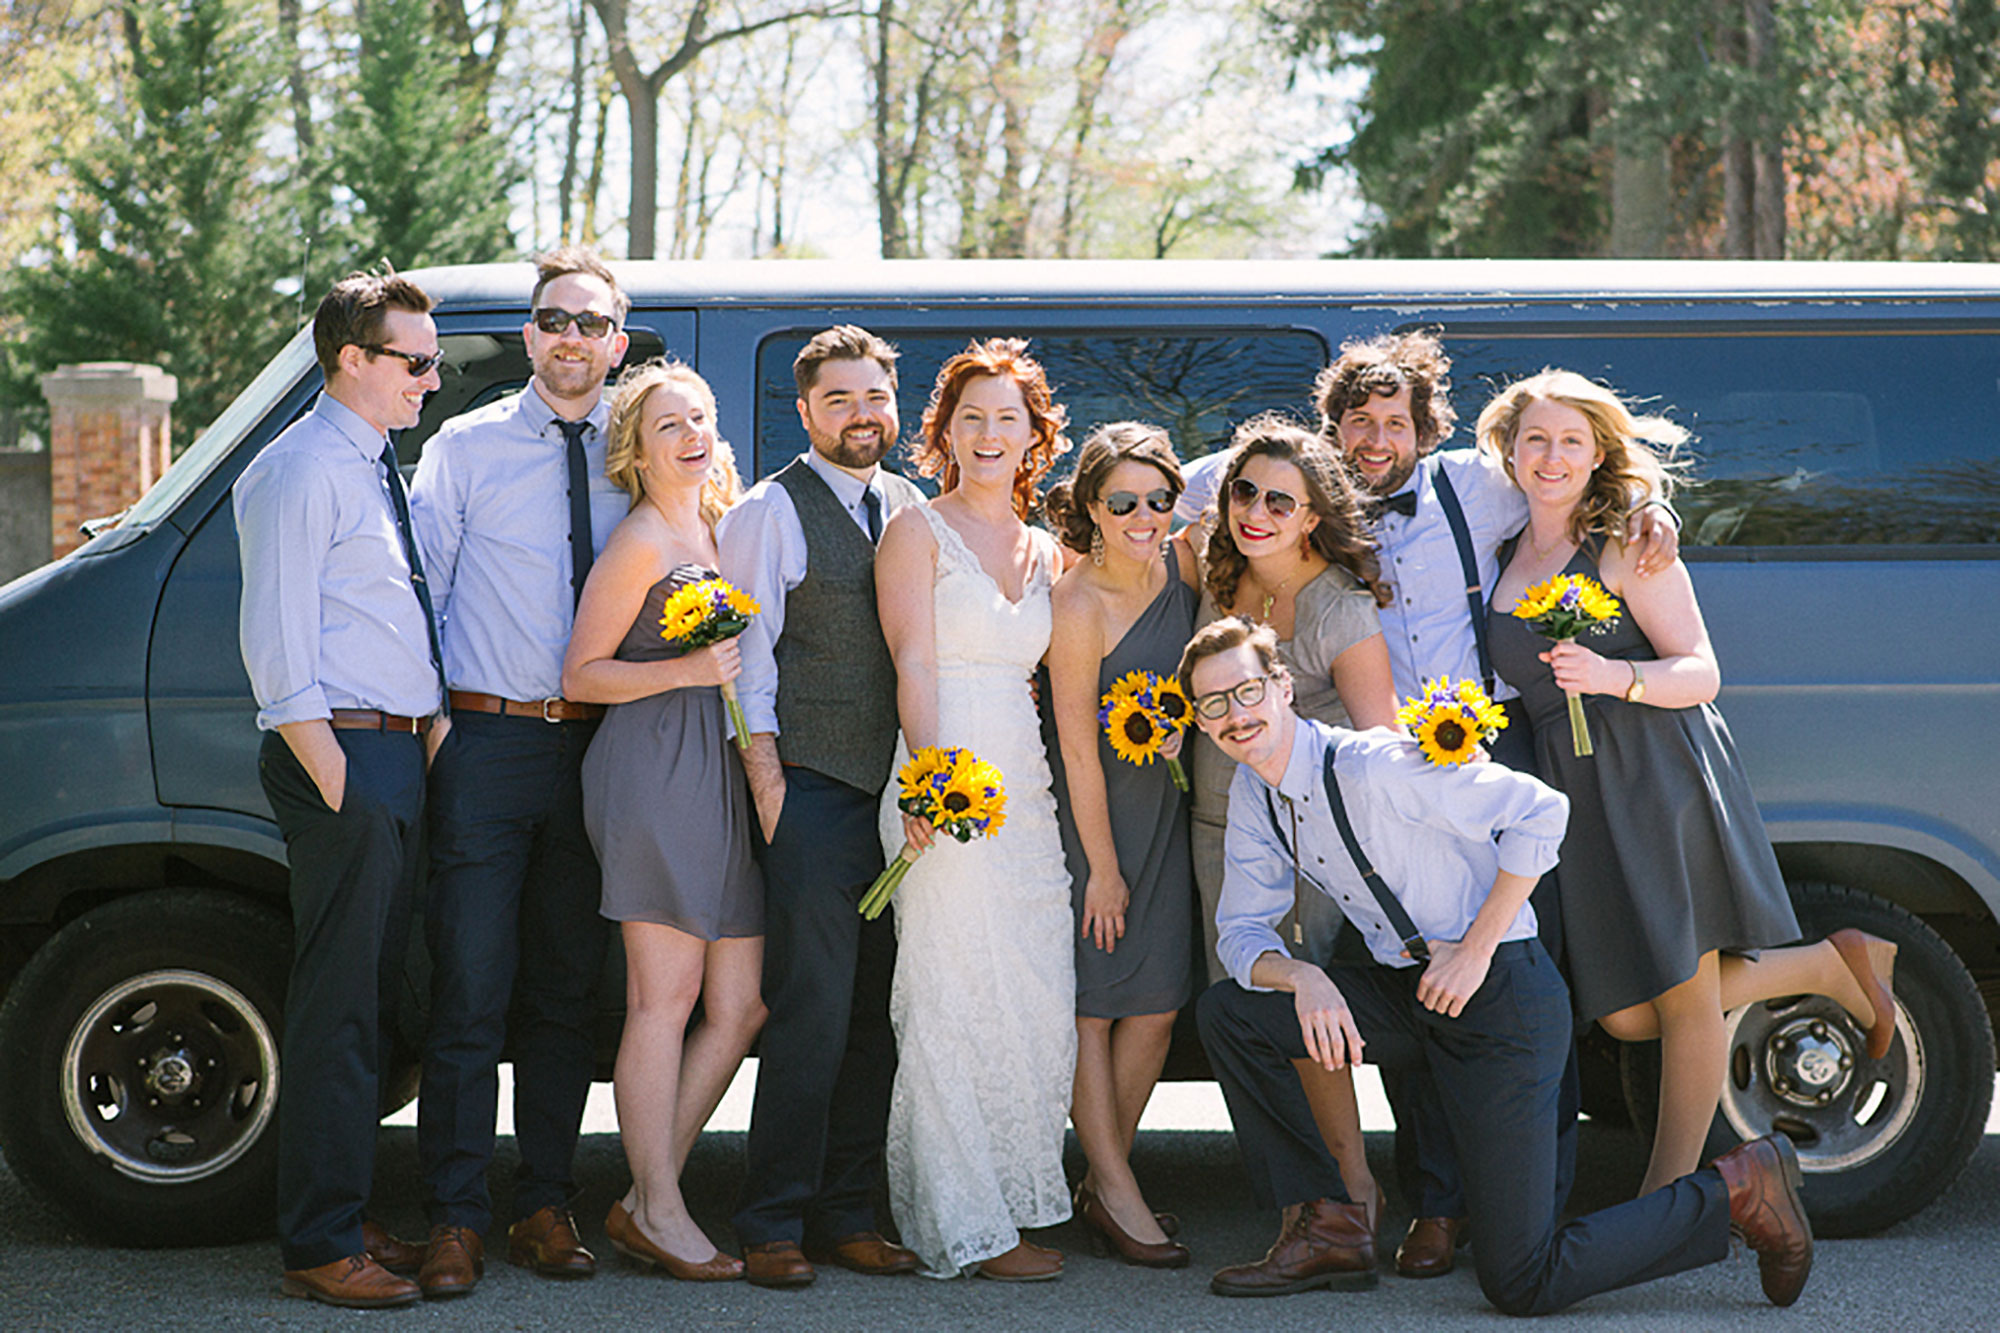 Navy-Hall-Wedding-Vineyard-Bride-Photo-By-Andrew-Mark-Photography-022.jpg